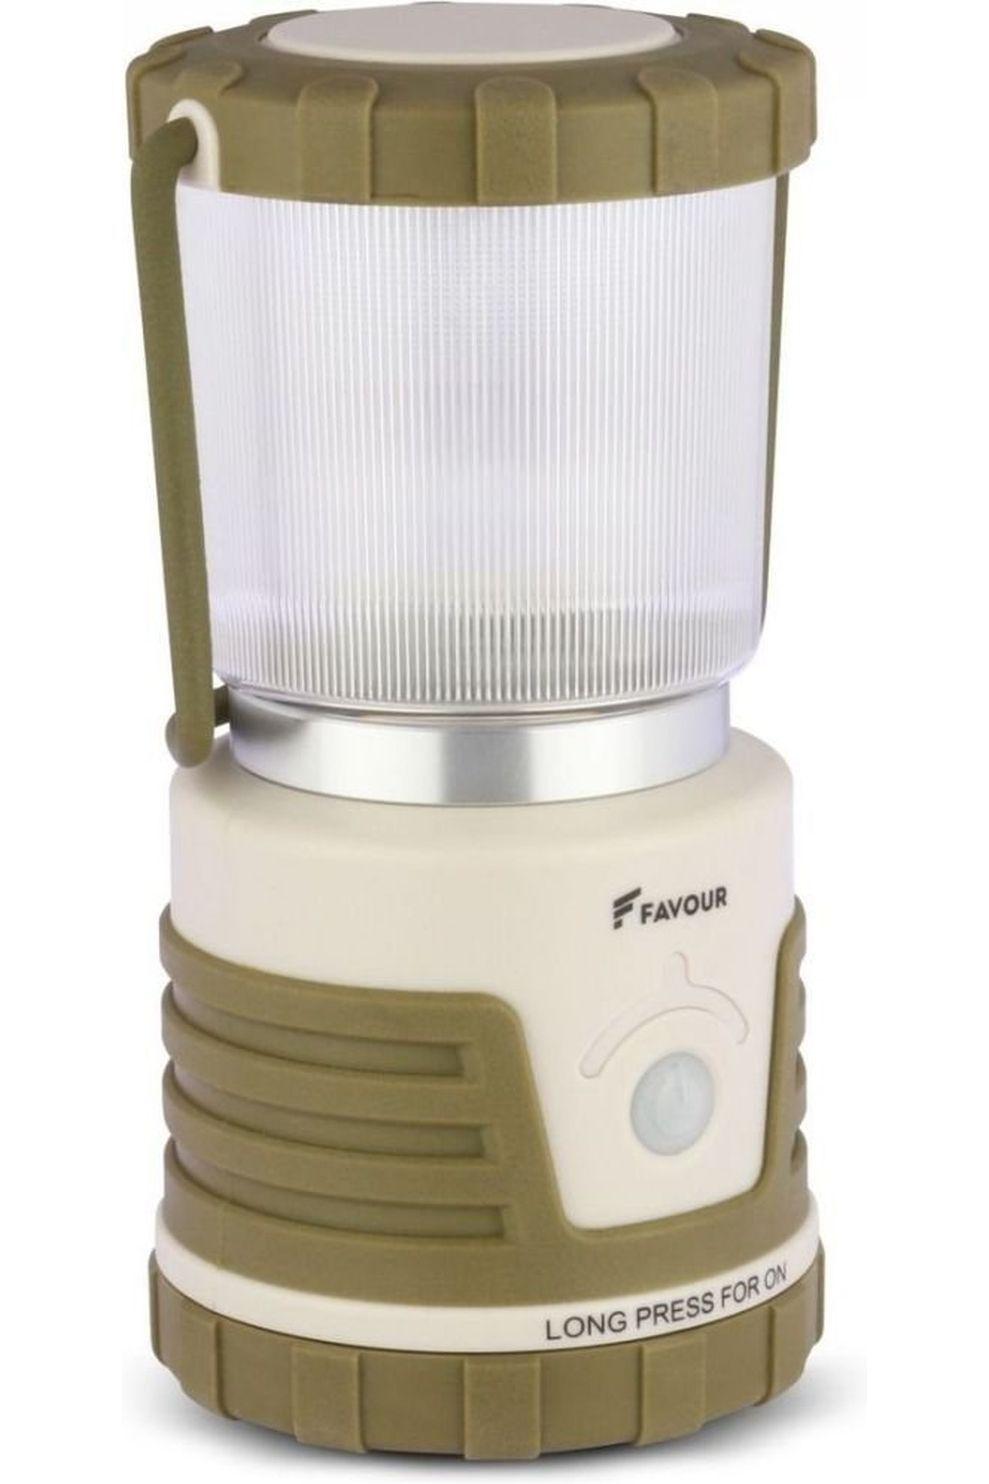 Favour L0434 Lantern 530LM - MiddenGroen/Wit